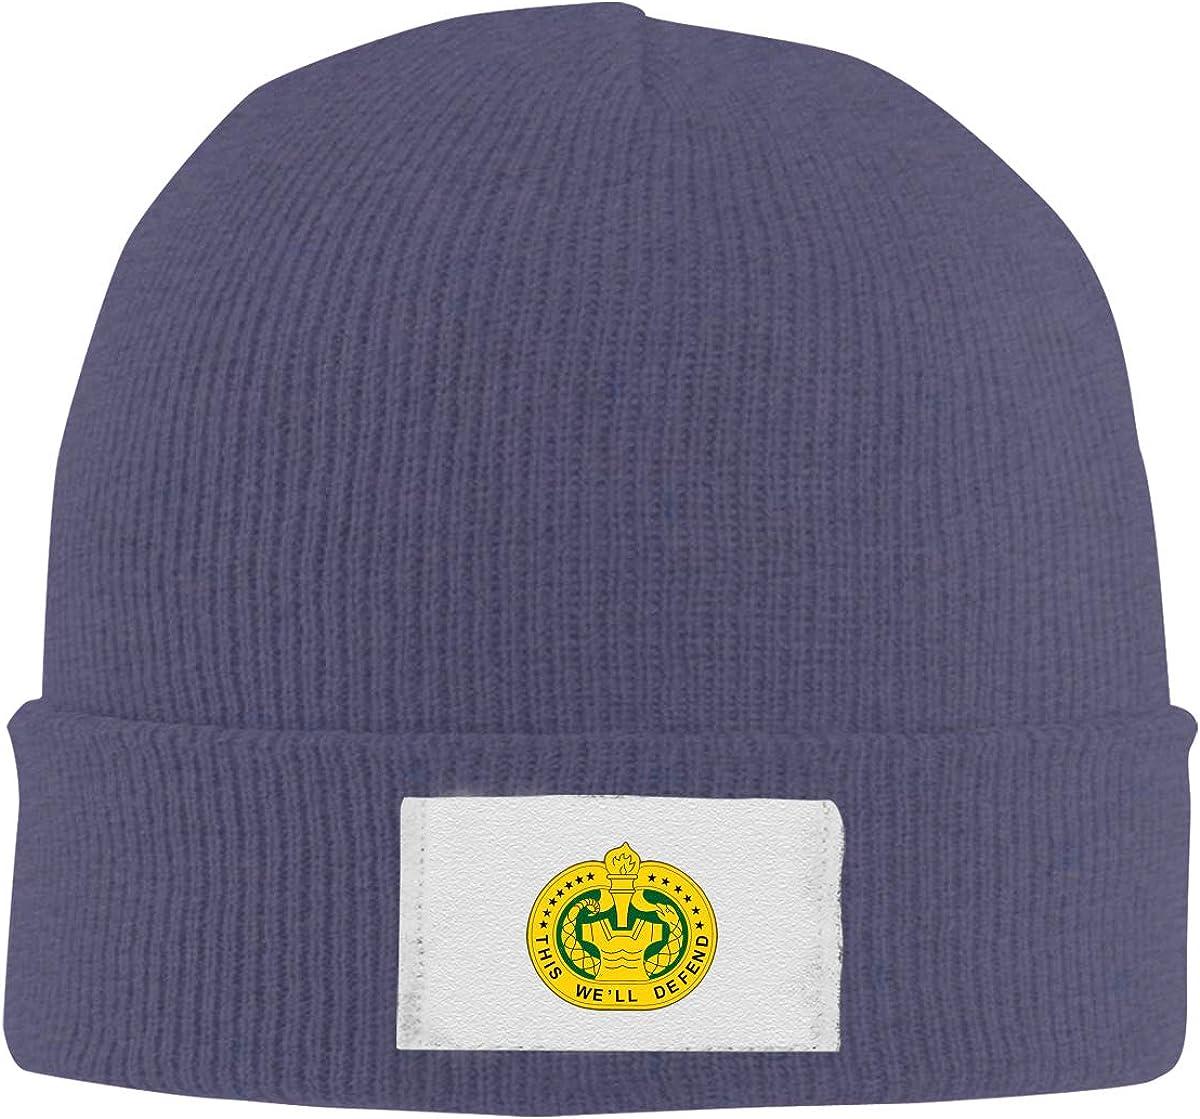 Dunpaiaa Skull Caps U S Army Drill Sergeant Logo Winter Warm Knit Hats Stretchy Cuff Beanie Hat Black